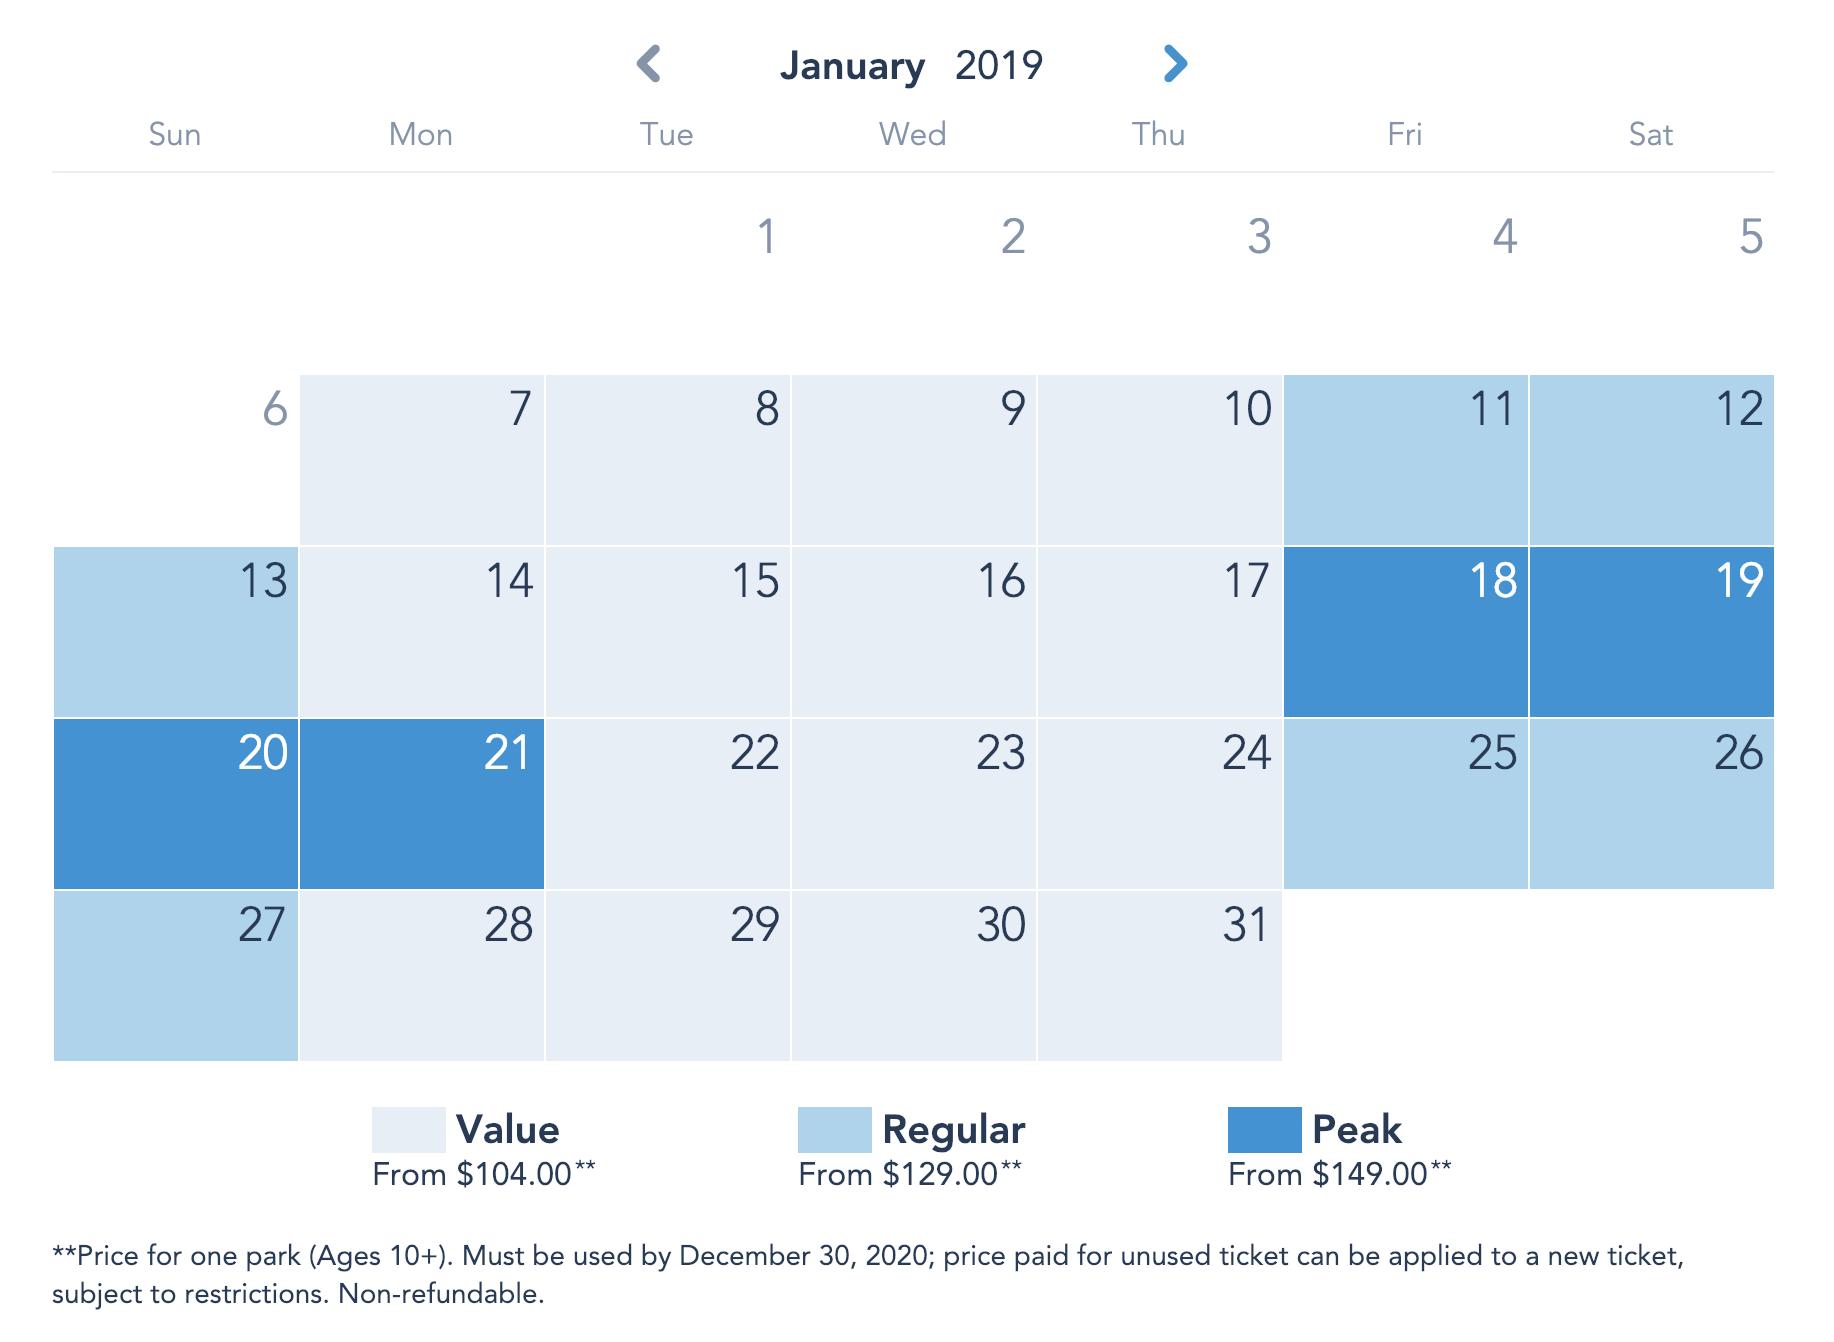 Disneyland Resort Prices - January